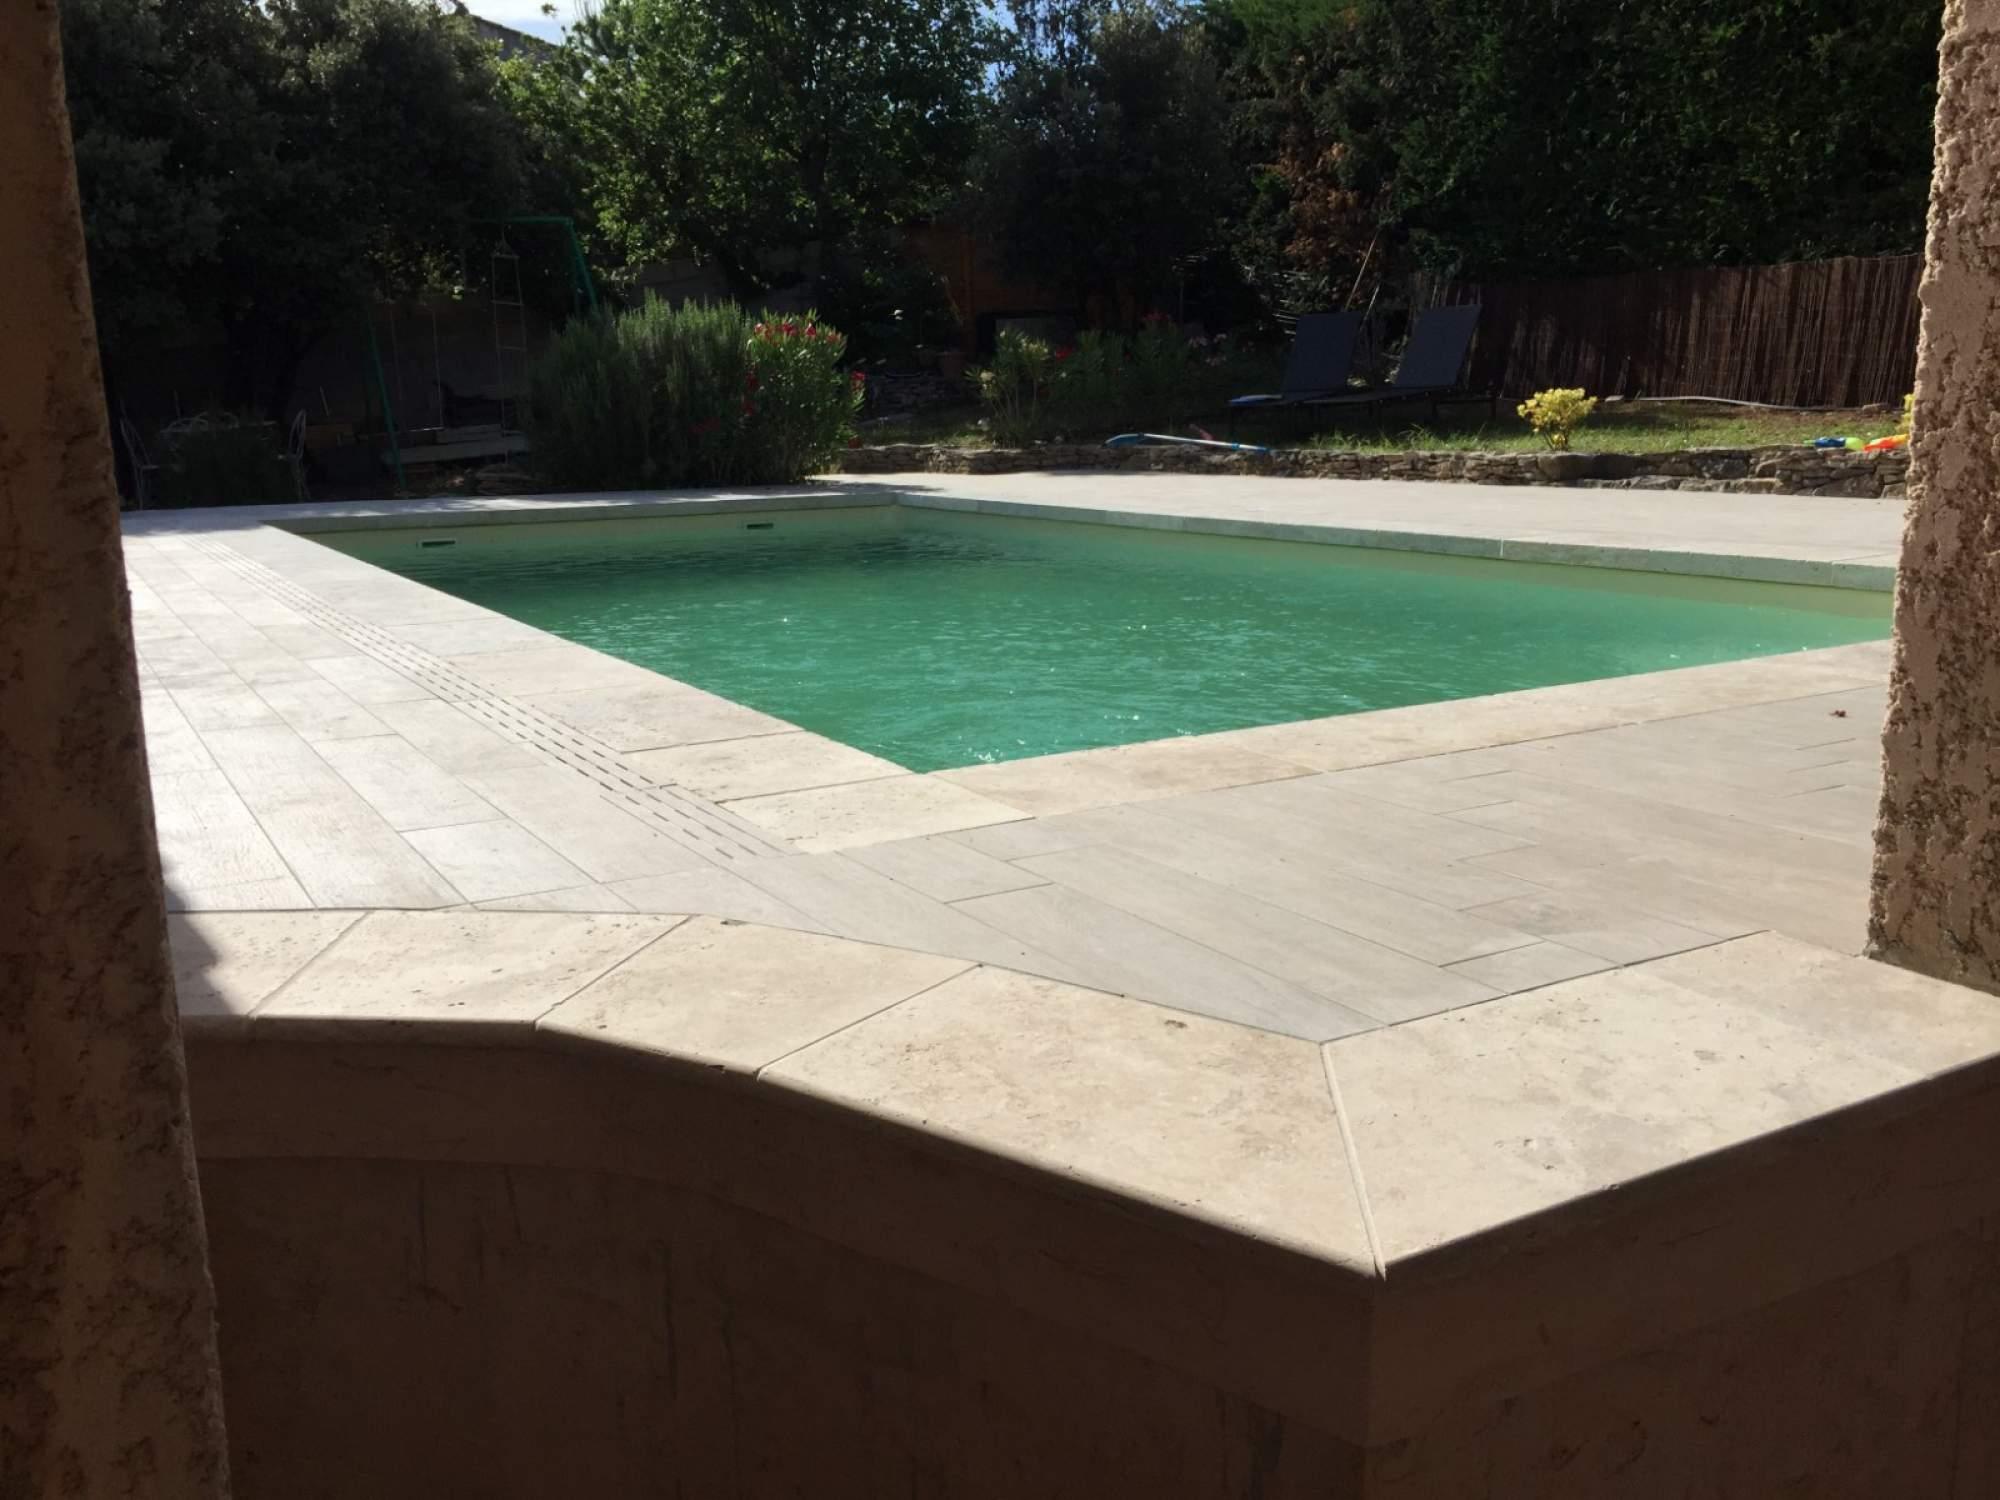 Abri piscine hors sol saint etienne maison design for Molitor piscine prix